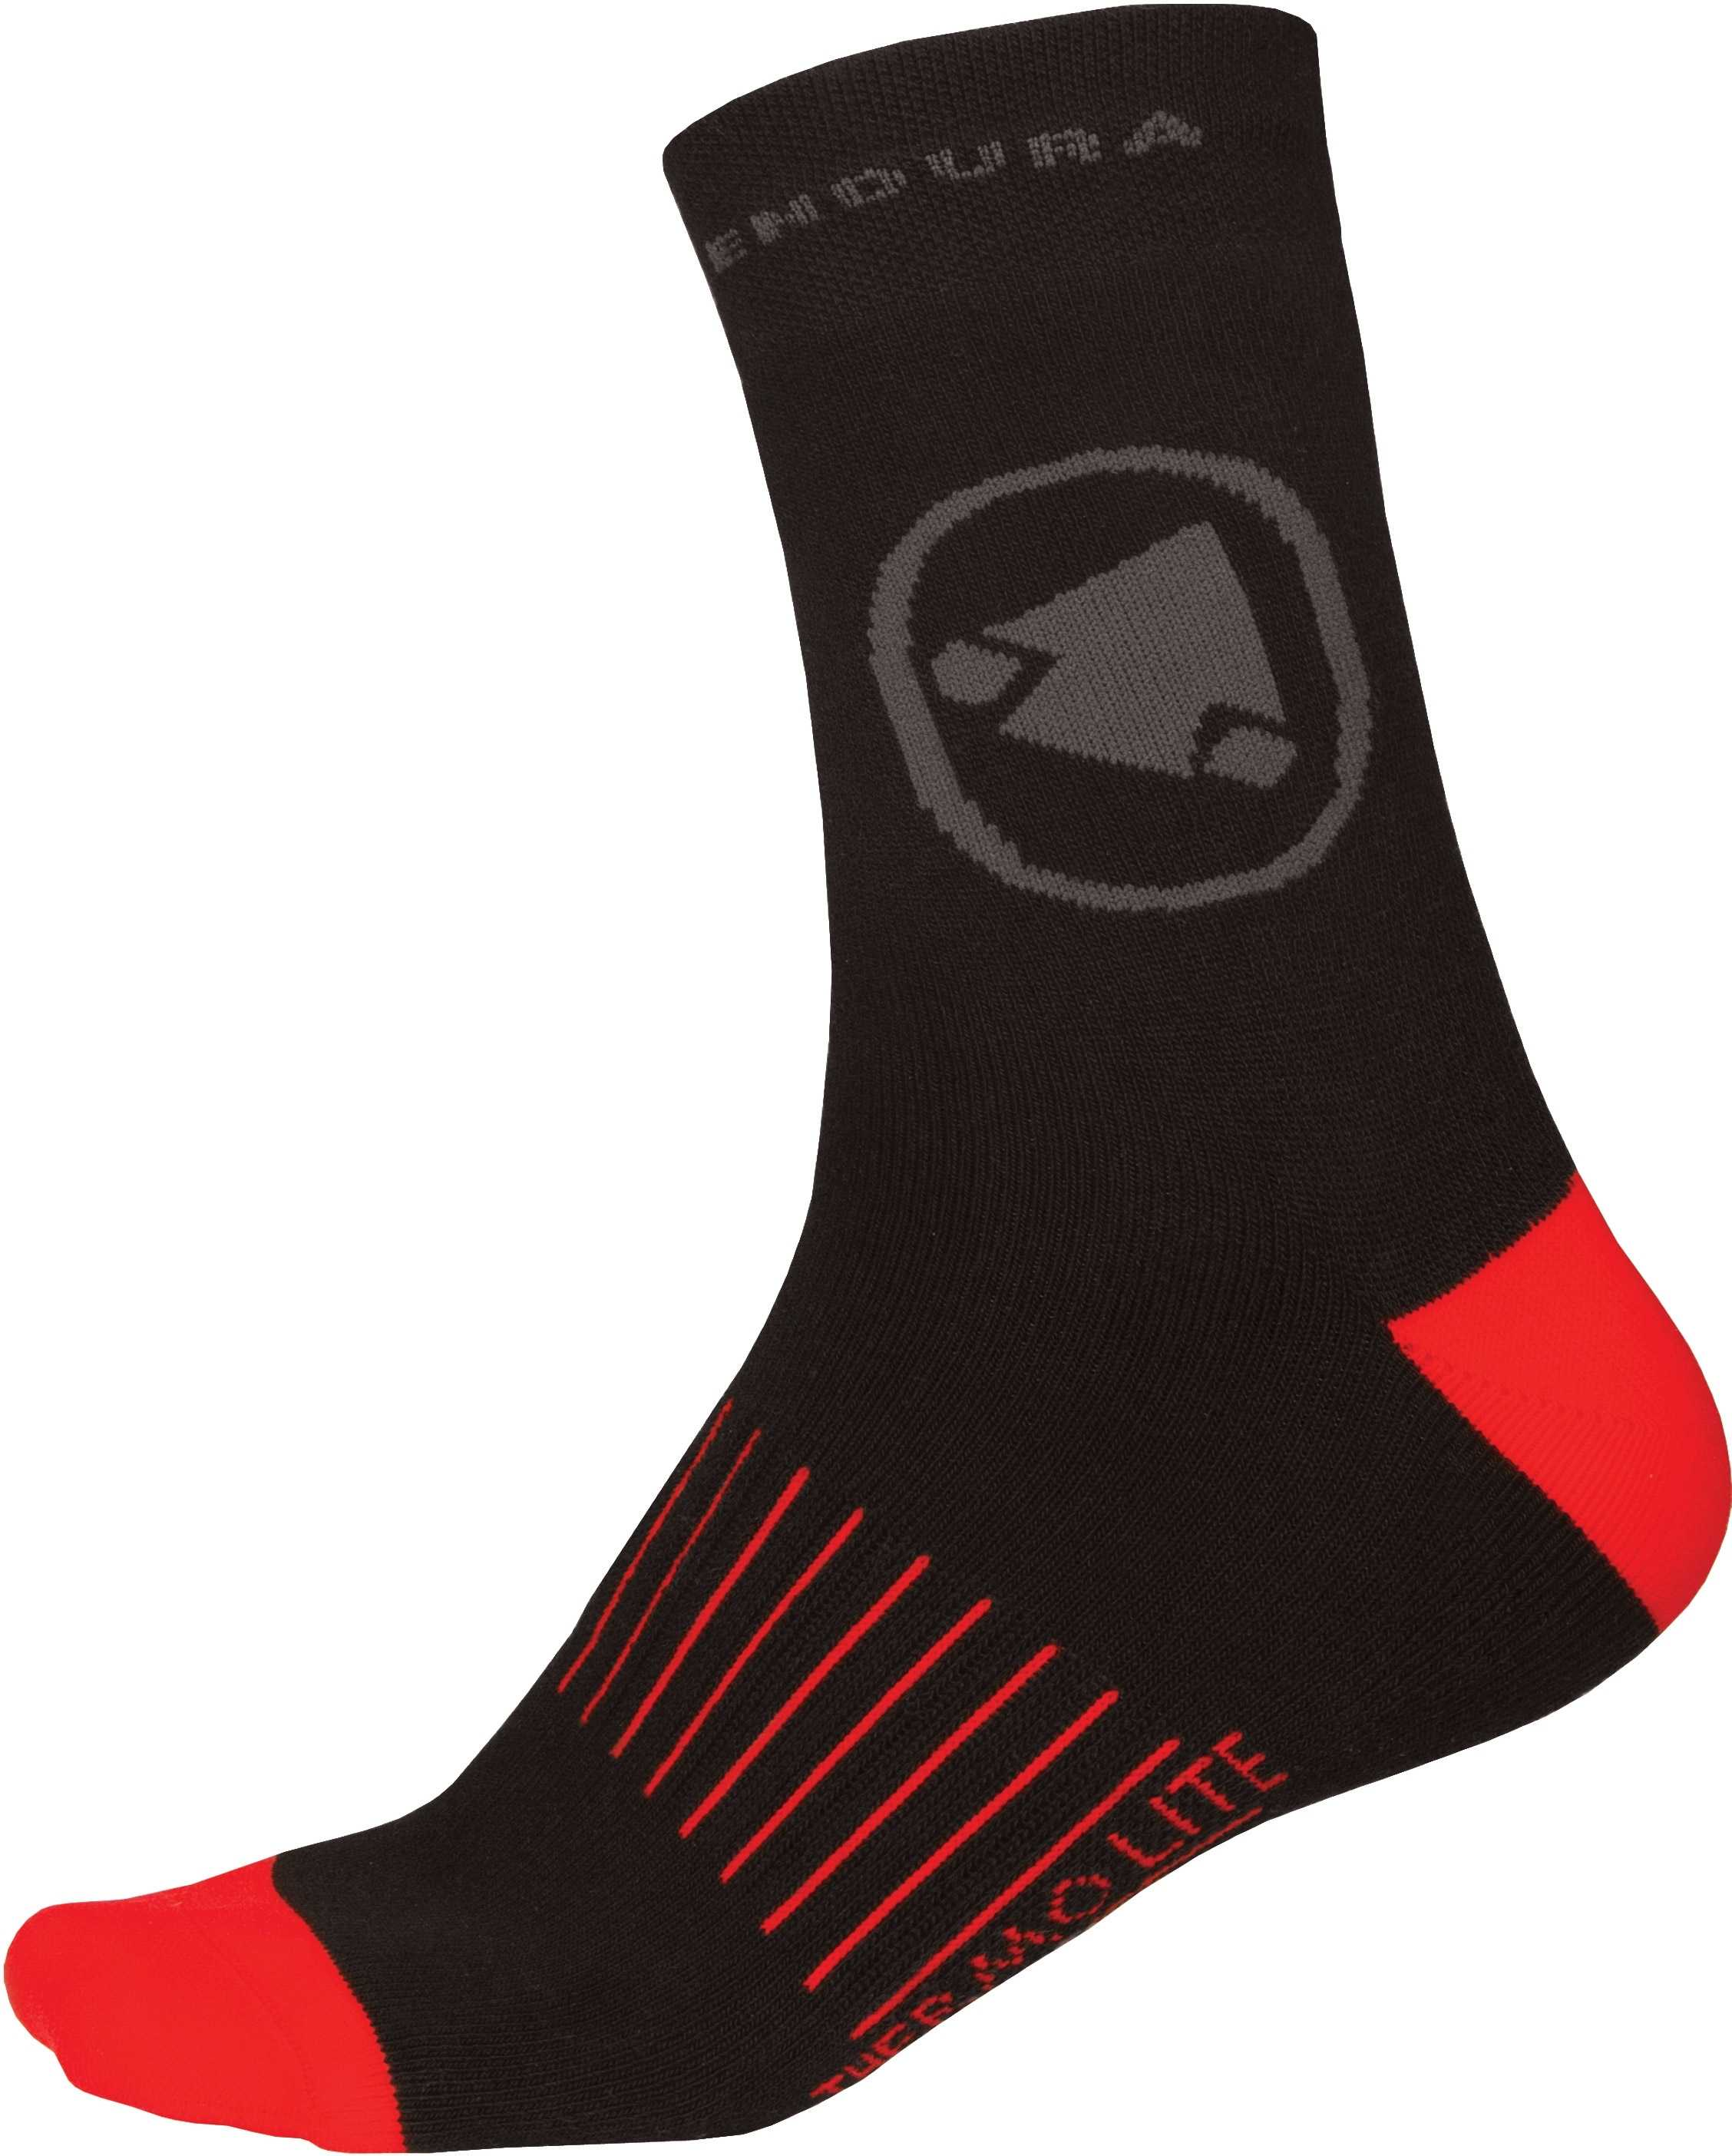 STRØMPER Endura Thermolite II sort 2-pack | Socks